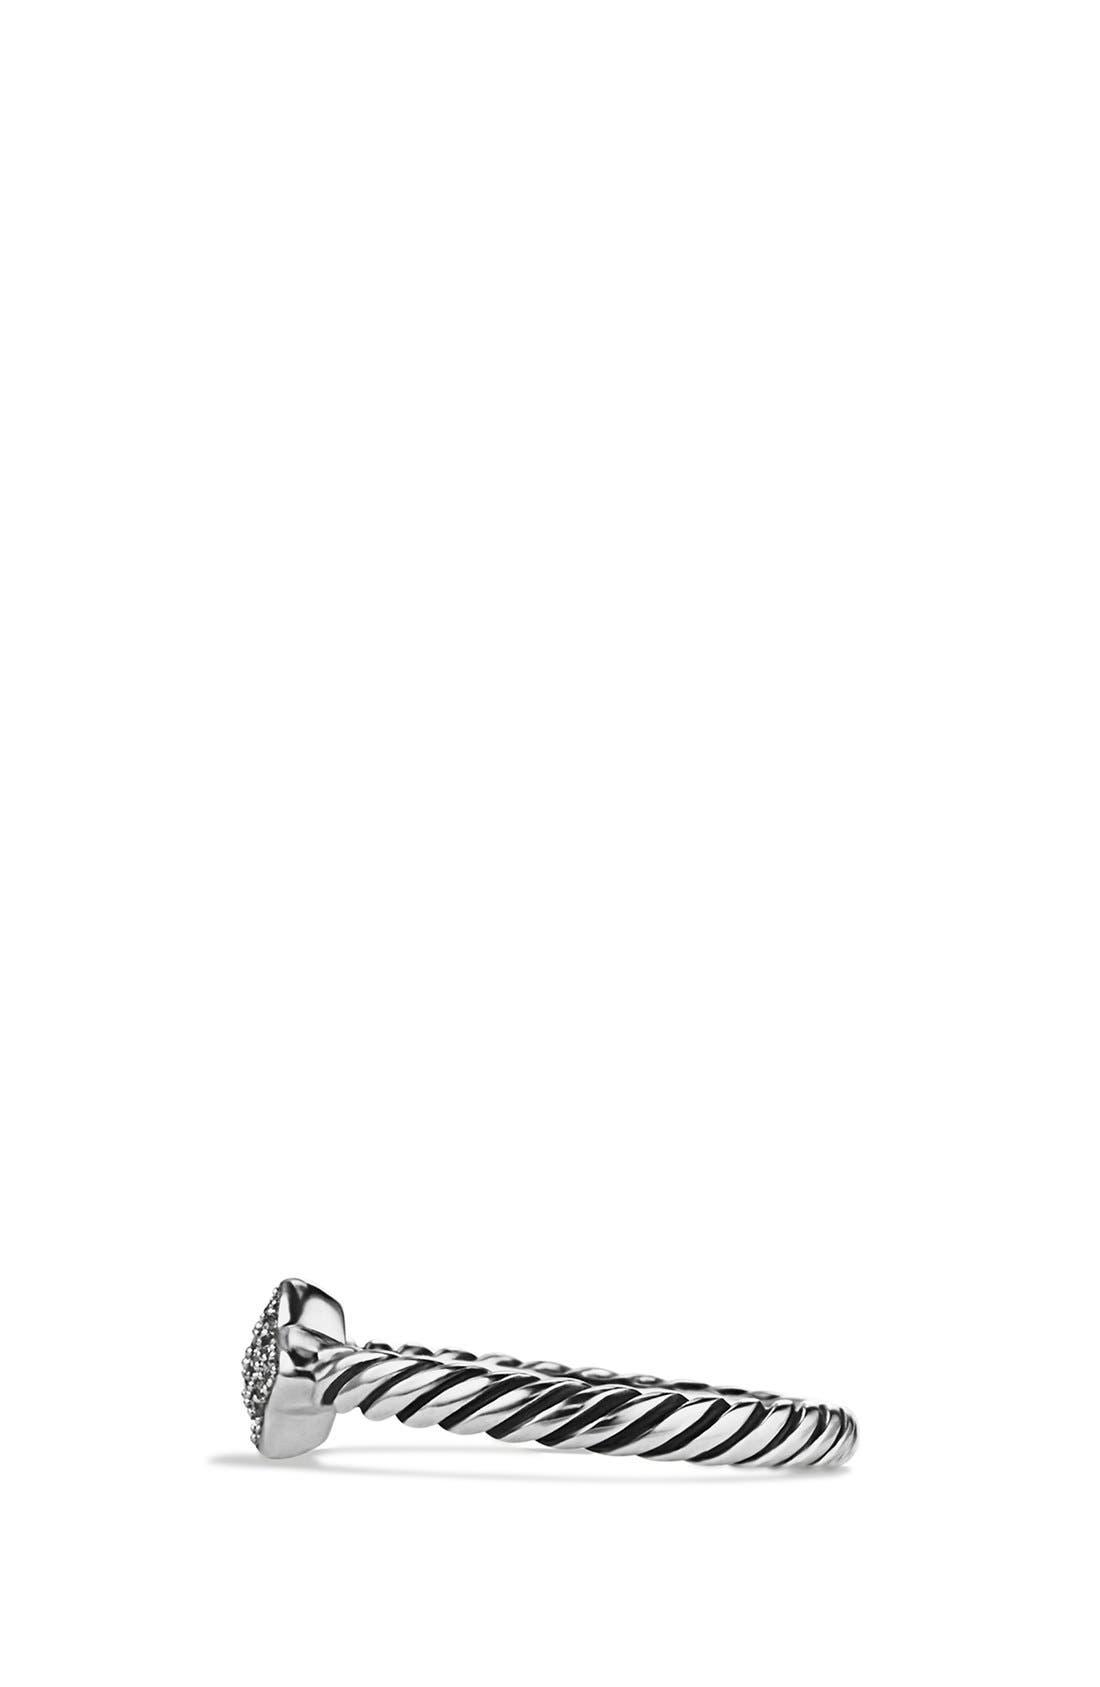 'Cable Collectibles - Quatrefoil' Ring with Diamonds,                             Alternate thumbnail 5, color,                             DIAMOND